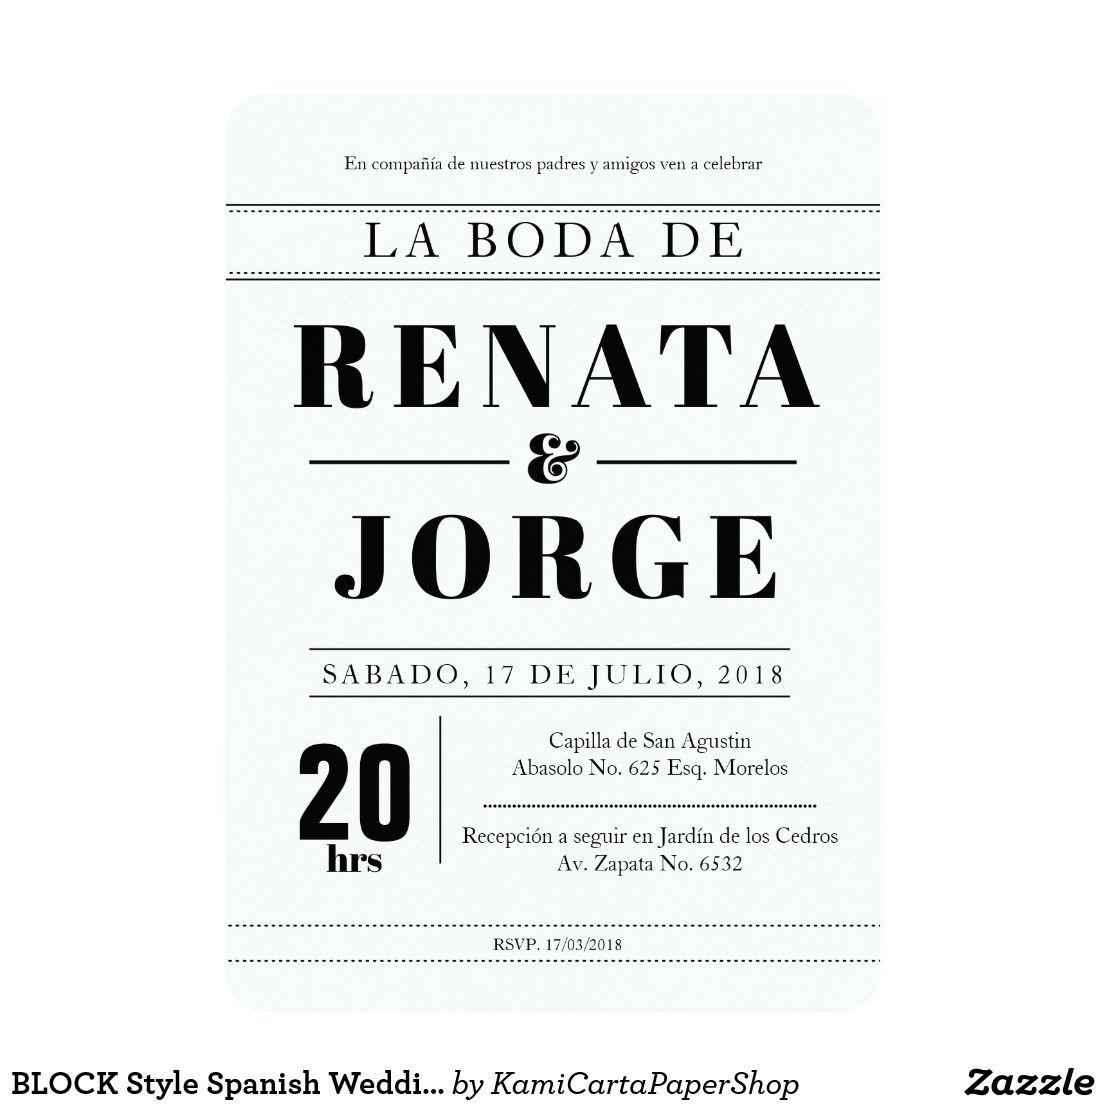 Block style spanish wedding invitation